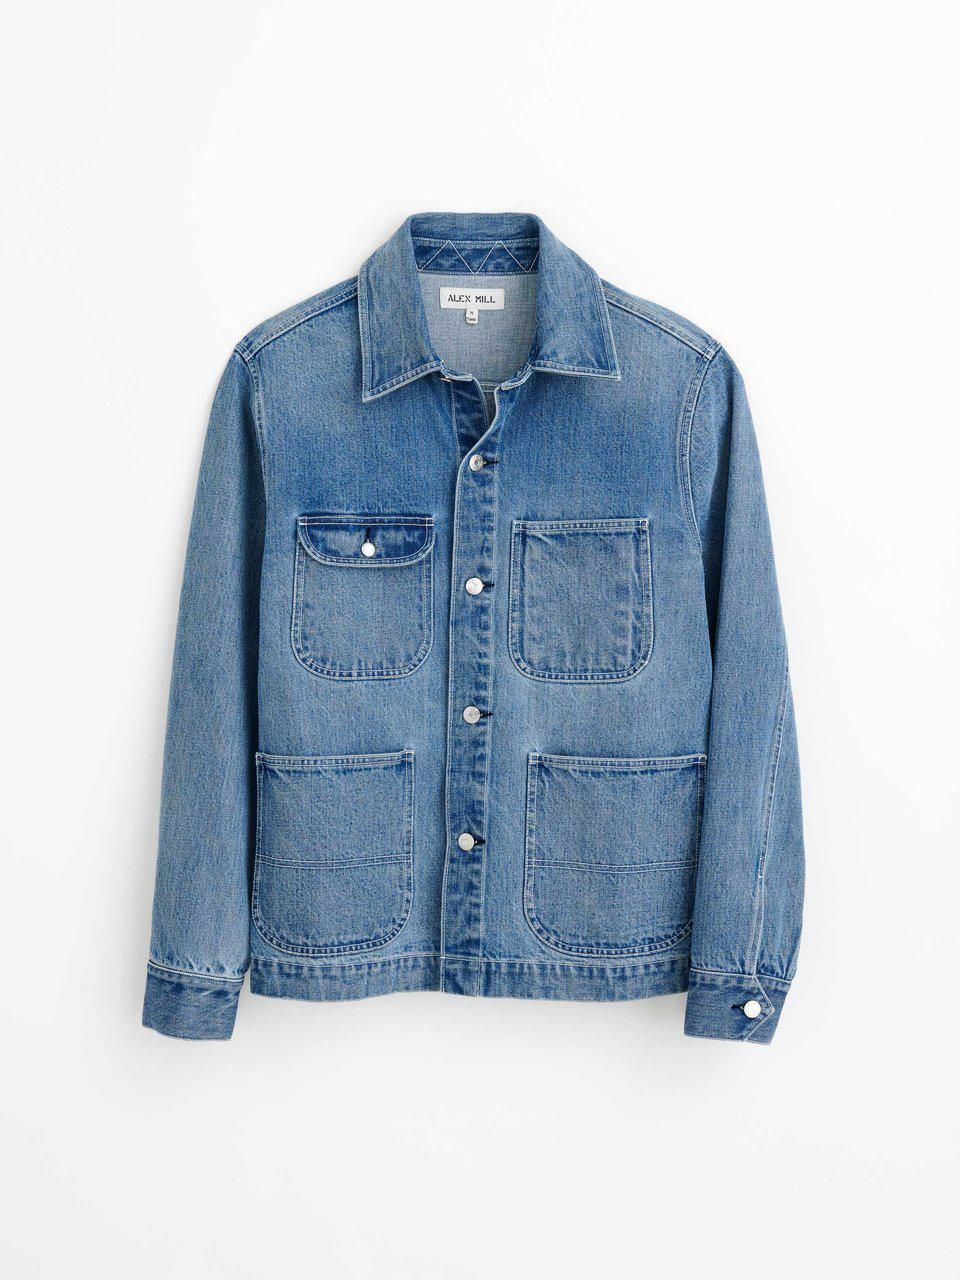 Work Jacket in Vintage Wash Denim